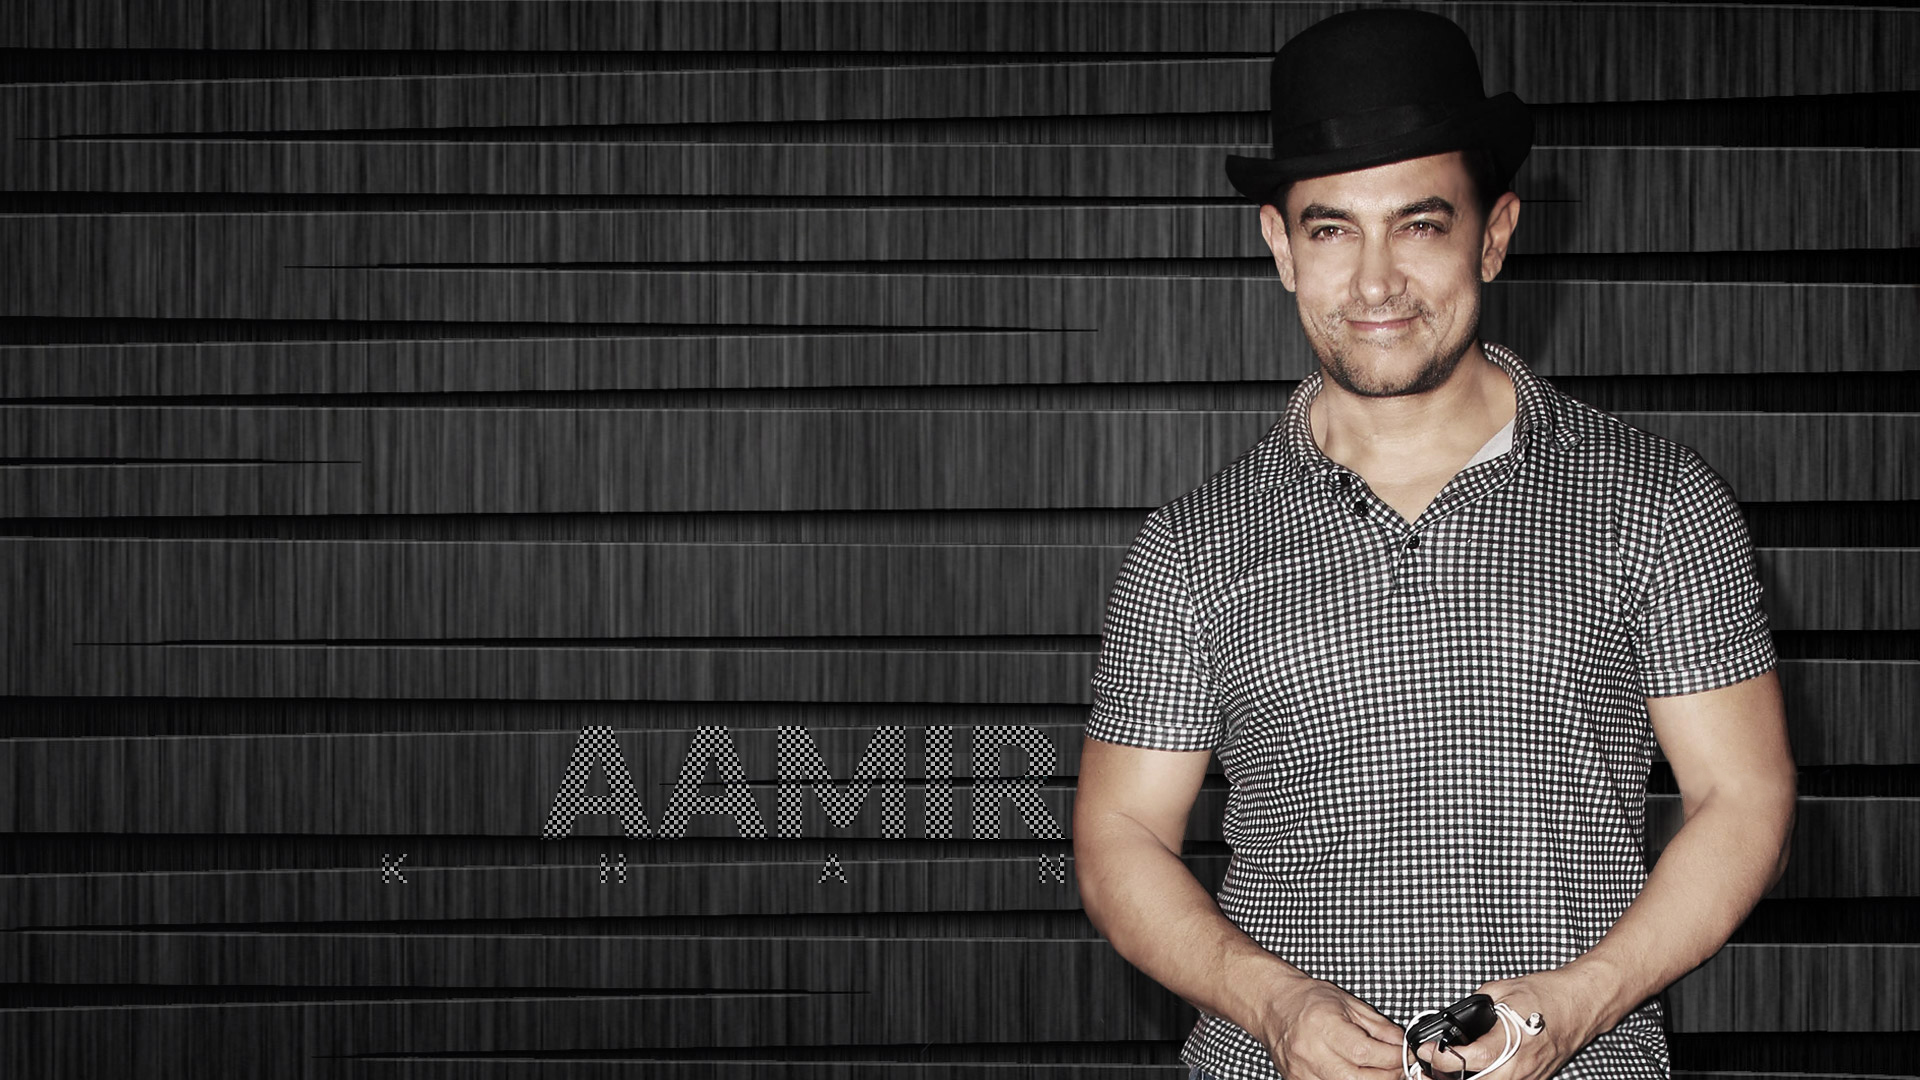 Aamir Khan Pic Download: Aamir Khan In Hat, Full HD Wallpaper